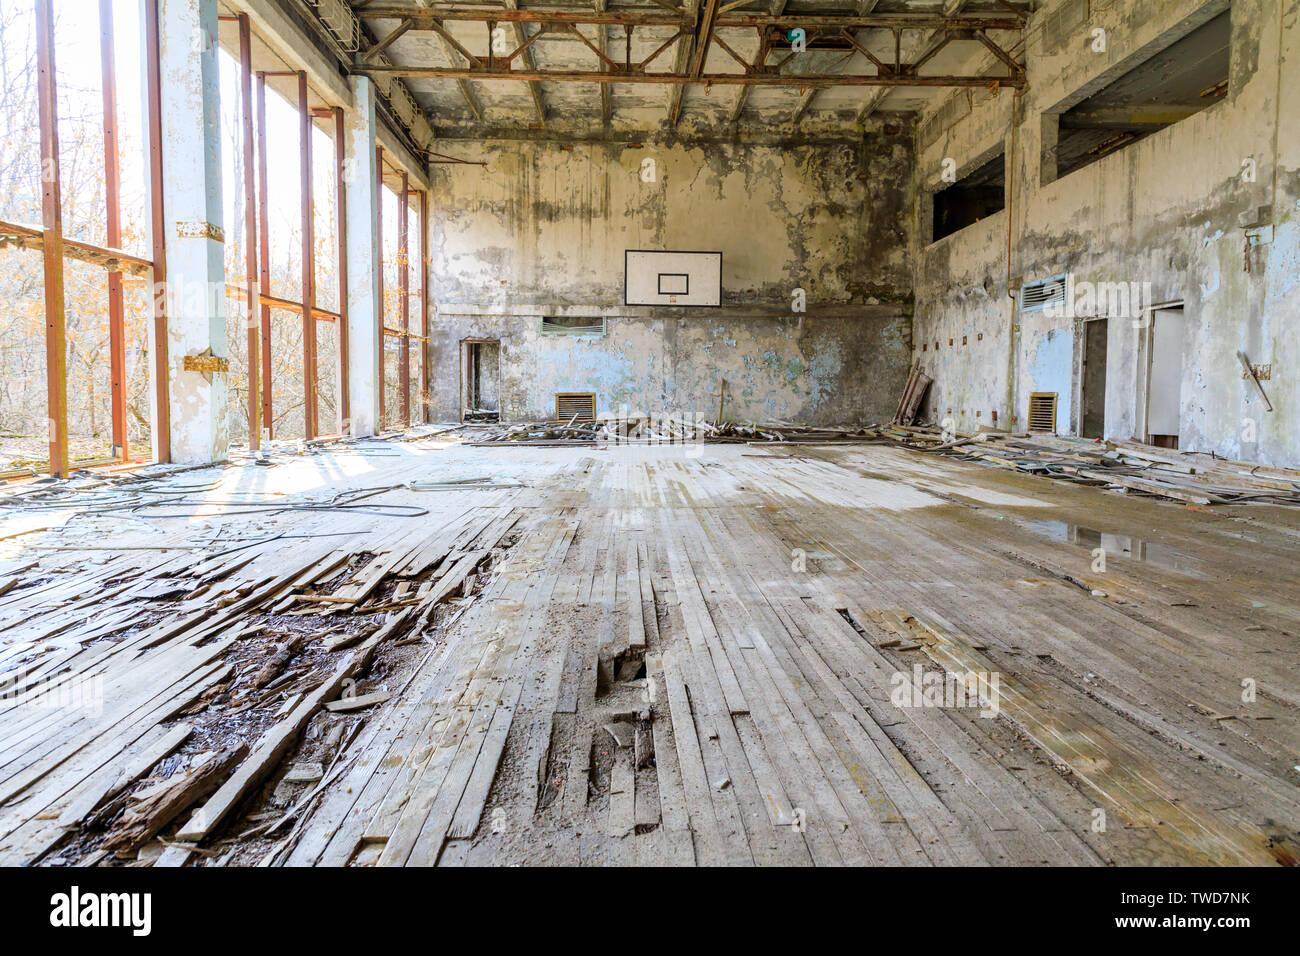 Eastern Europe, Ukraine, Pripyat, Chernobyl. Basketball court. - Stock Image